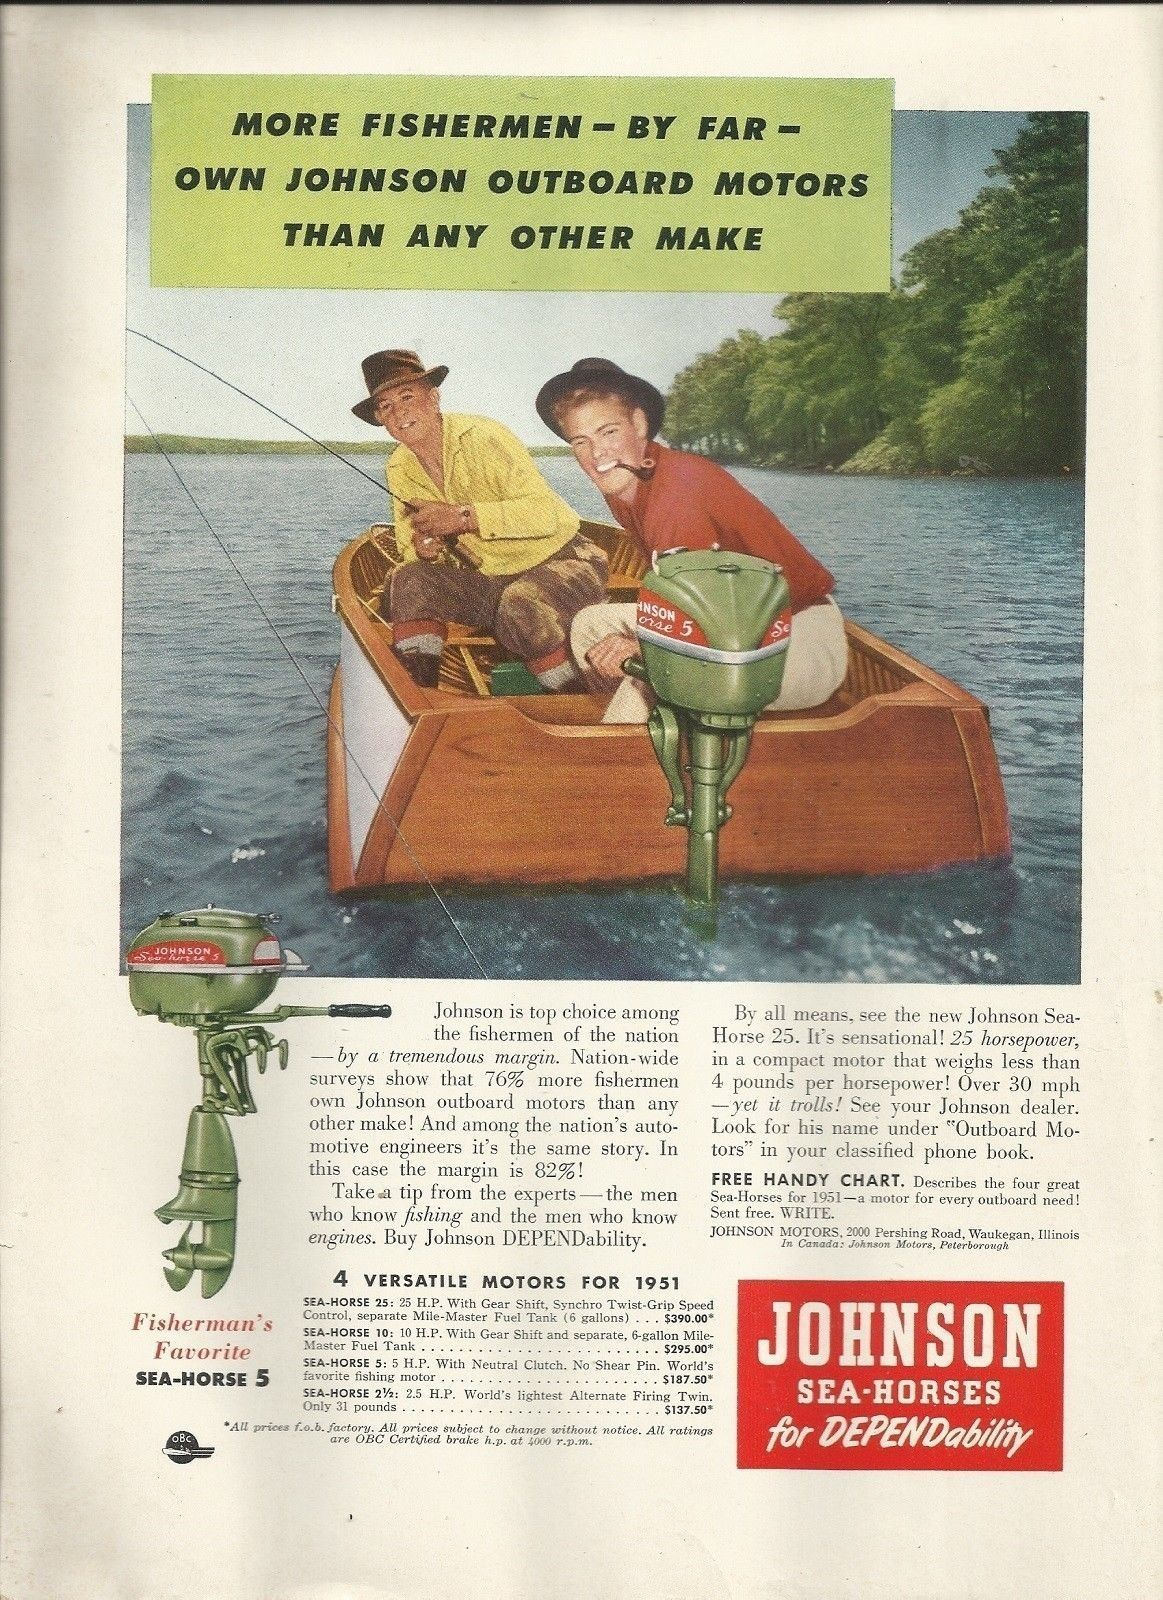 1951 Johnson Motors Color Ad- The Johnson Sea- Horse 5 HP Outboard Motors,